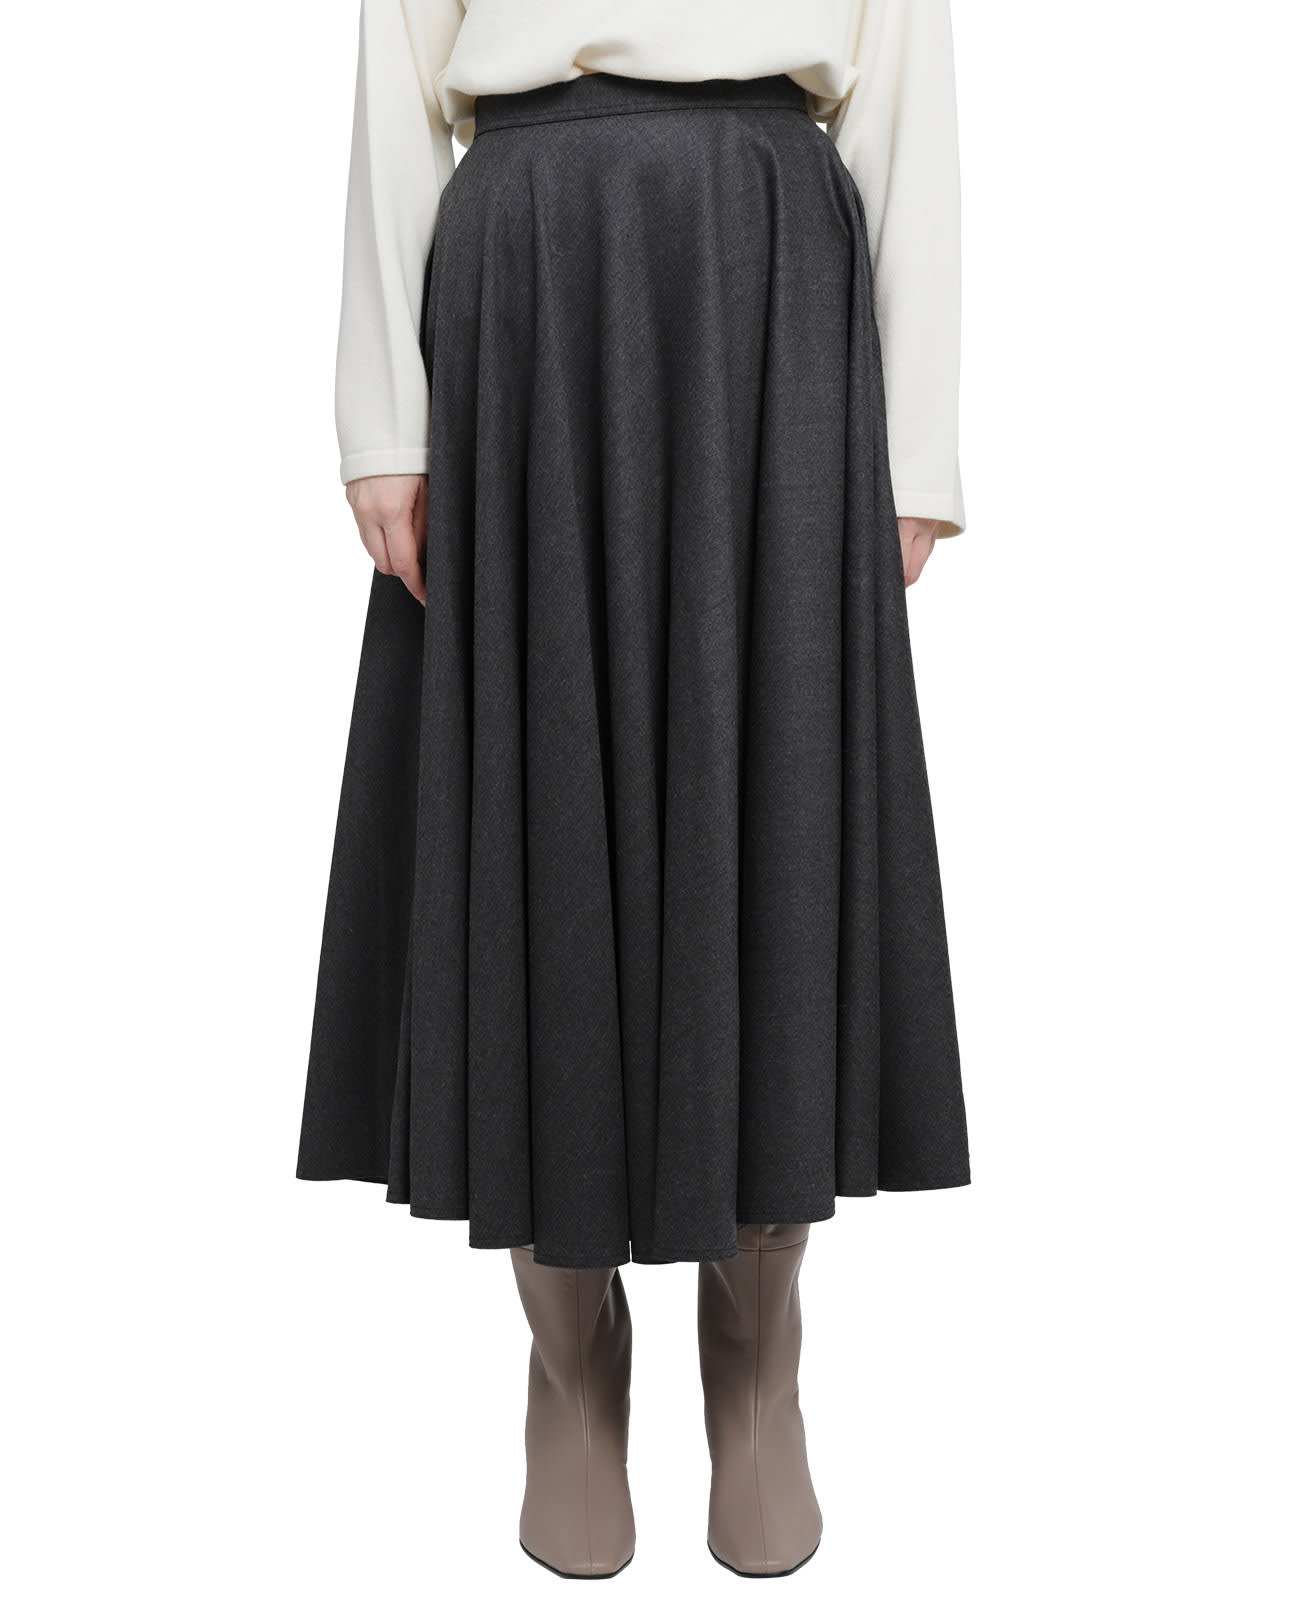 Portofino Grey Skirt